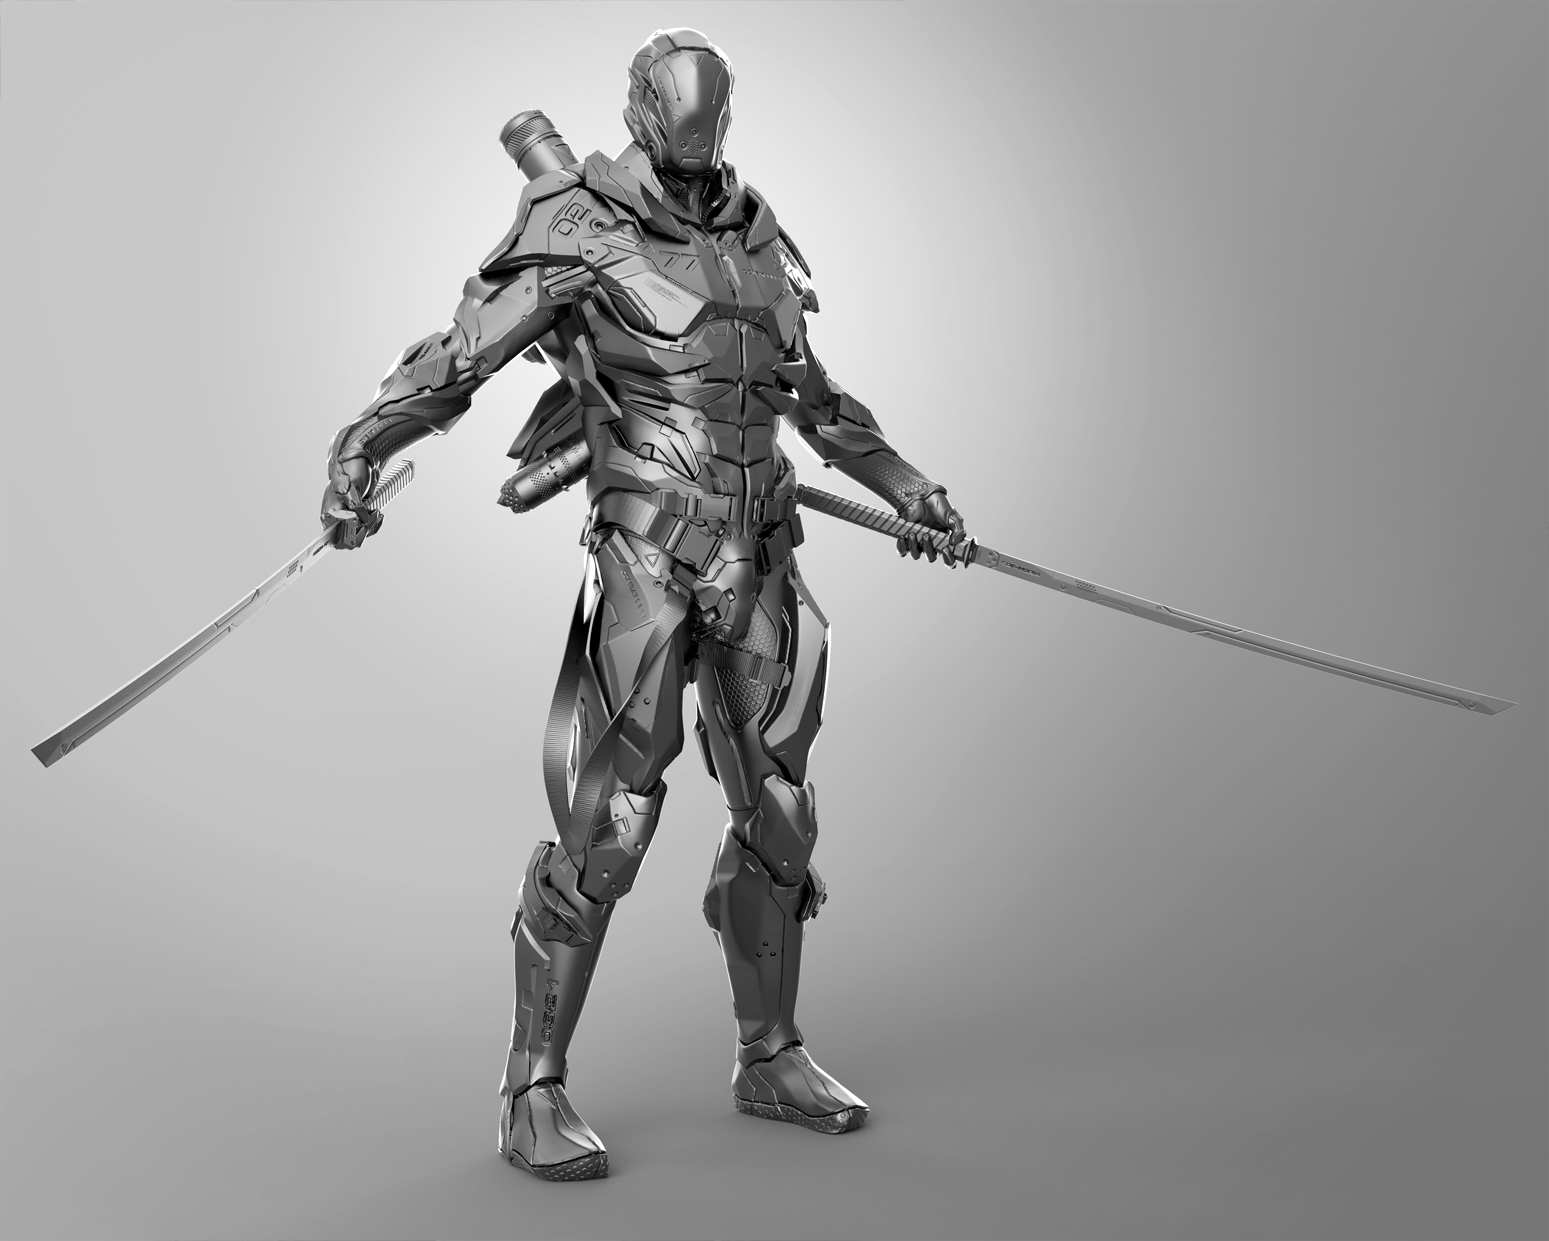 Futuristic Soldier Suit_ShaunSherman_SML.jpg